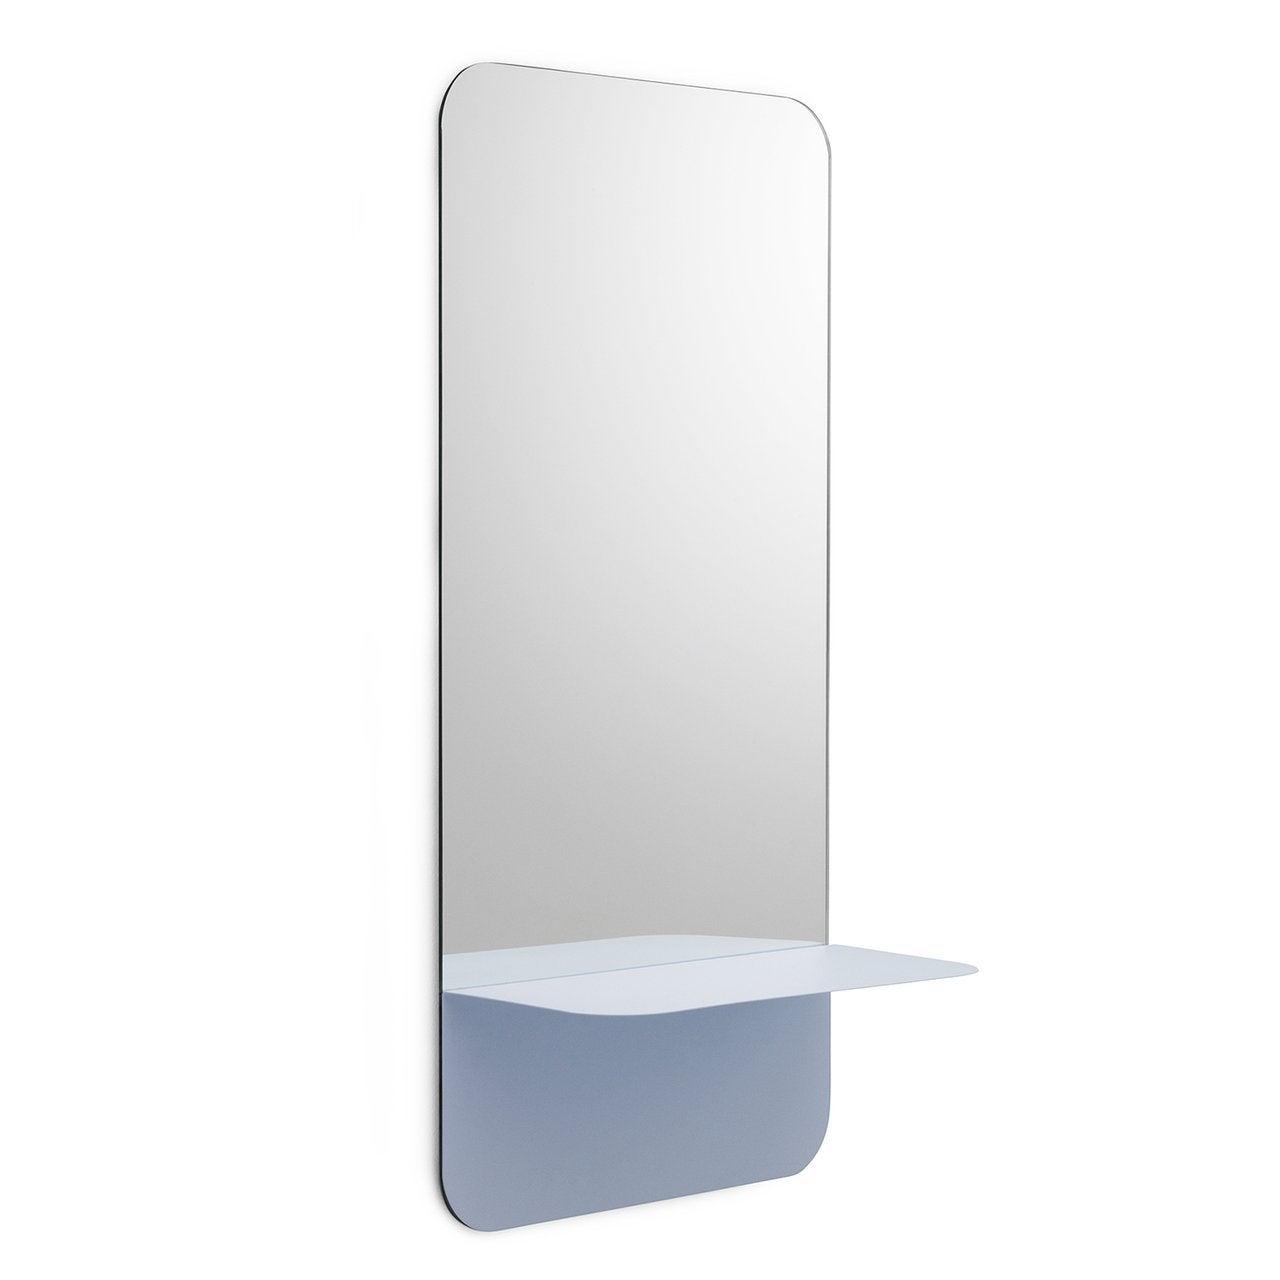 Light Blue Mirror With Shelf